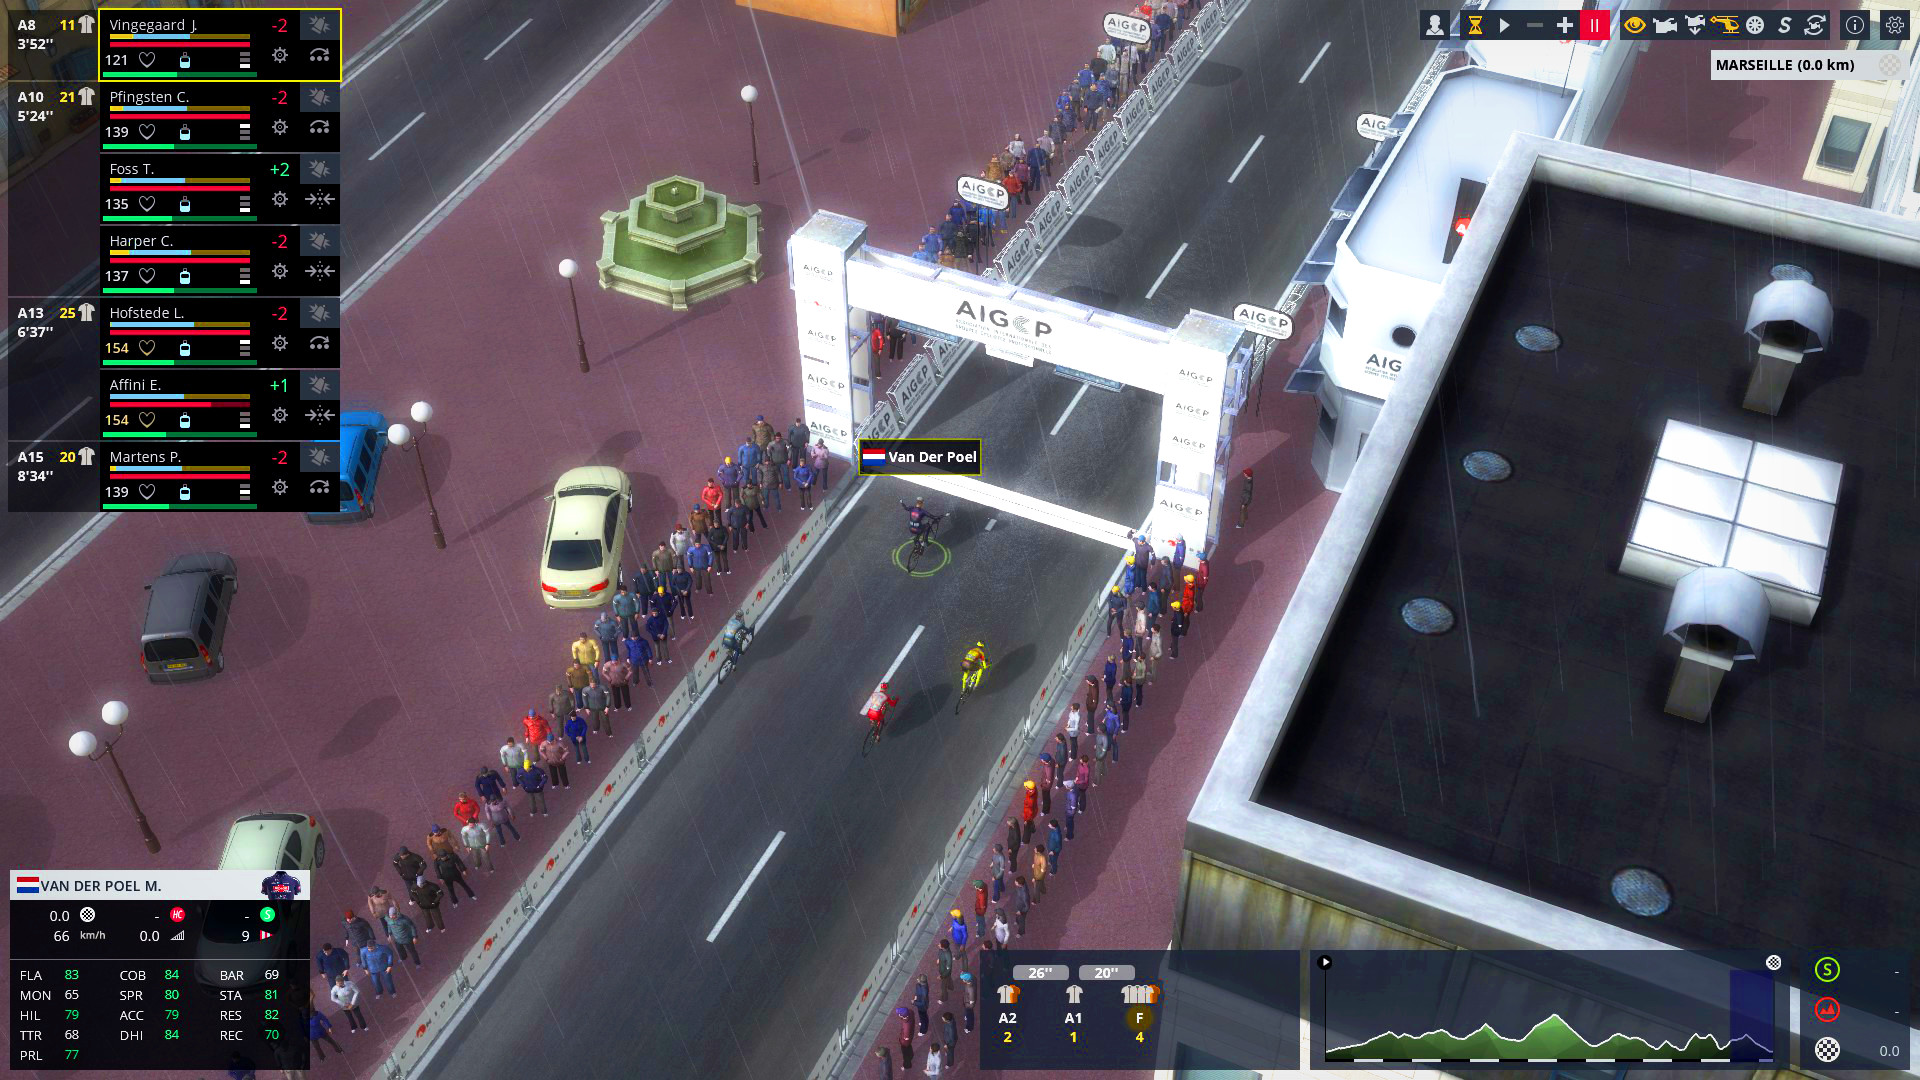 pro-cycling-manager-2021-pc-screenshot-1